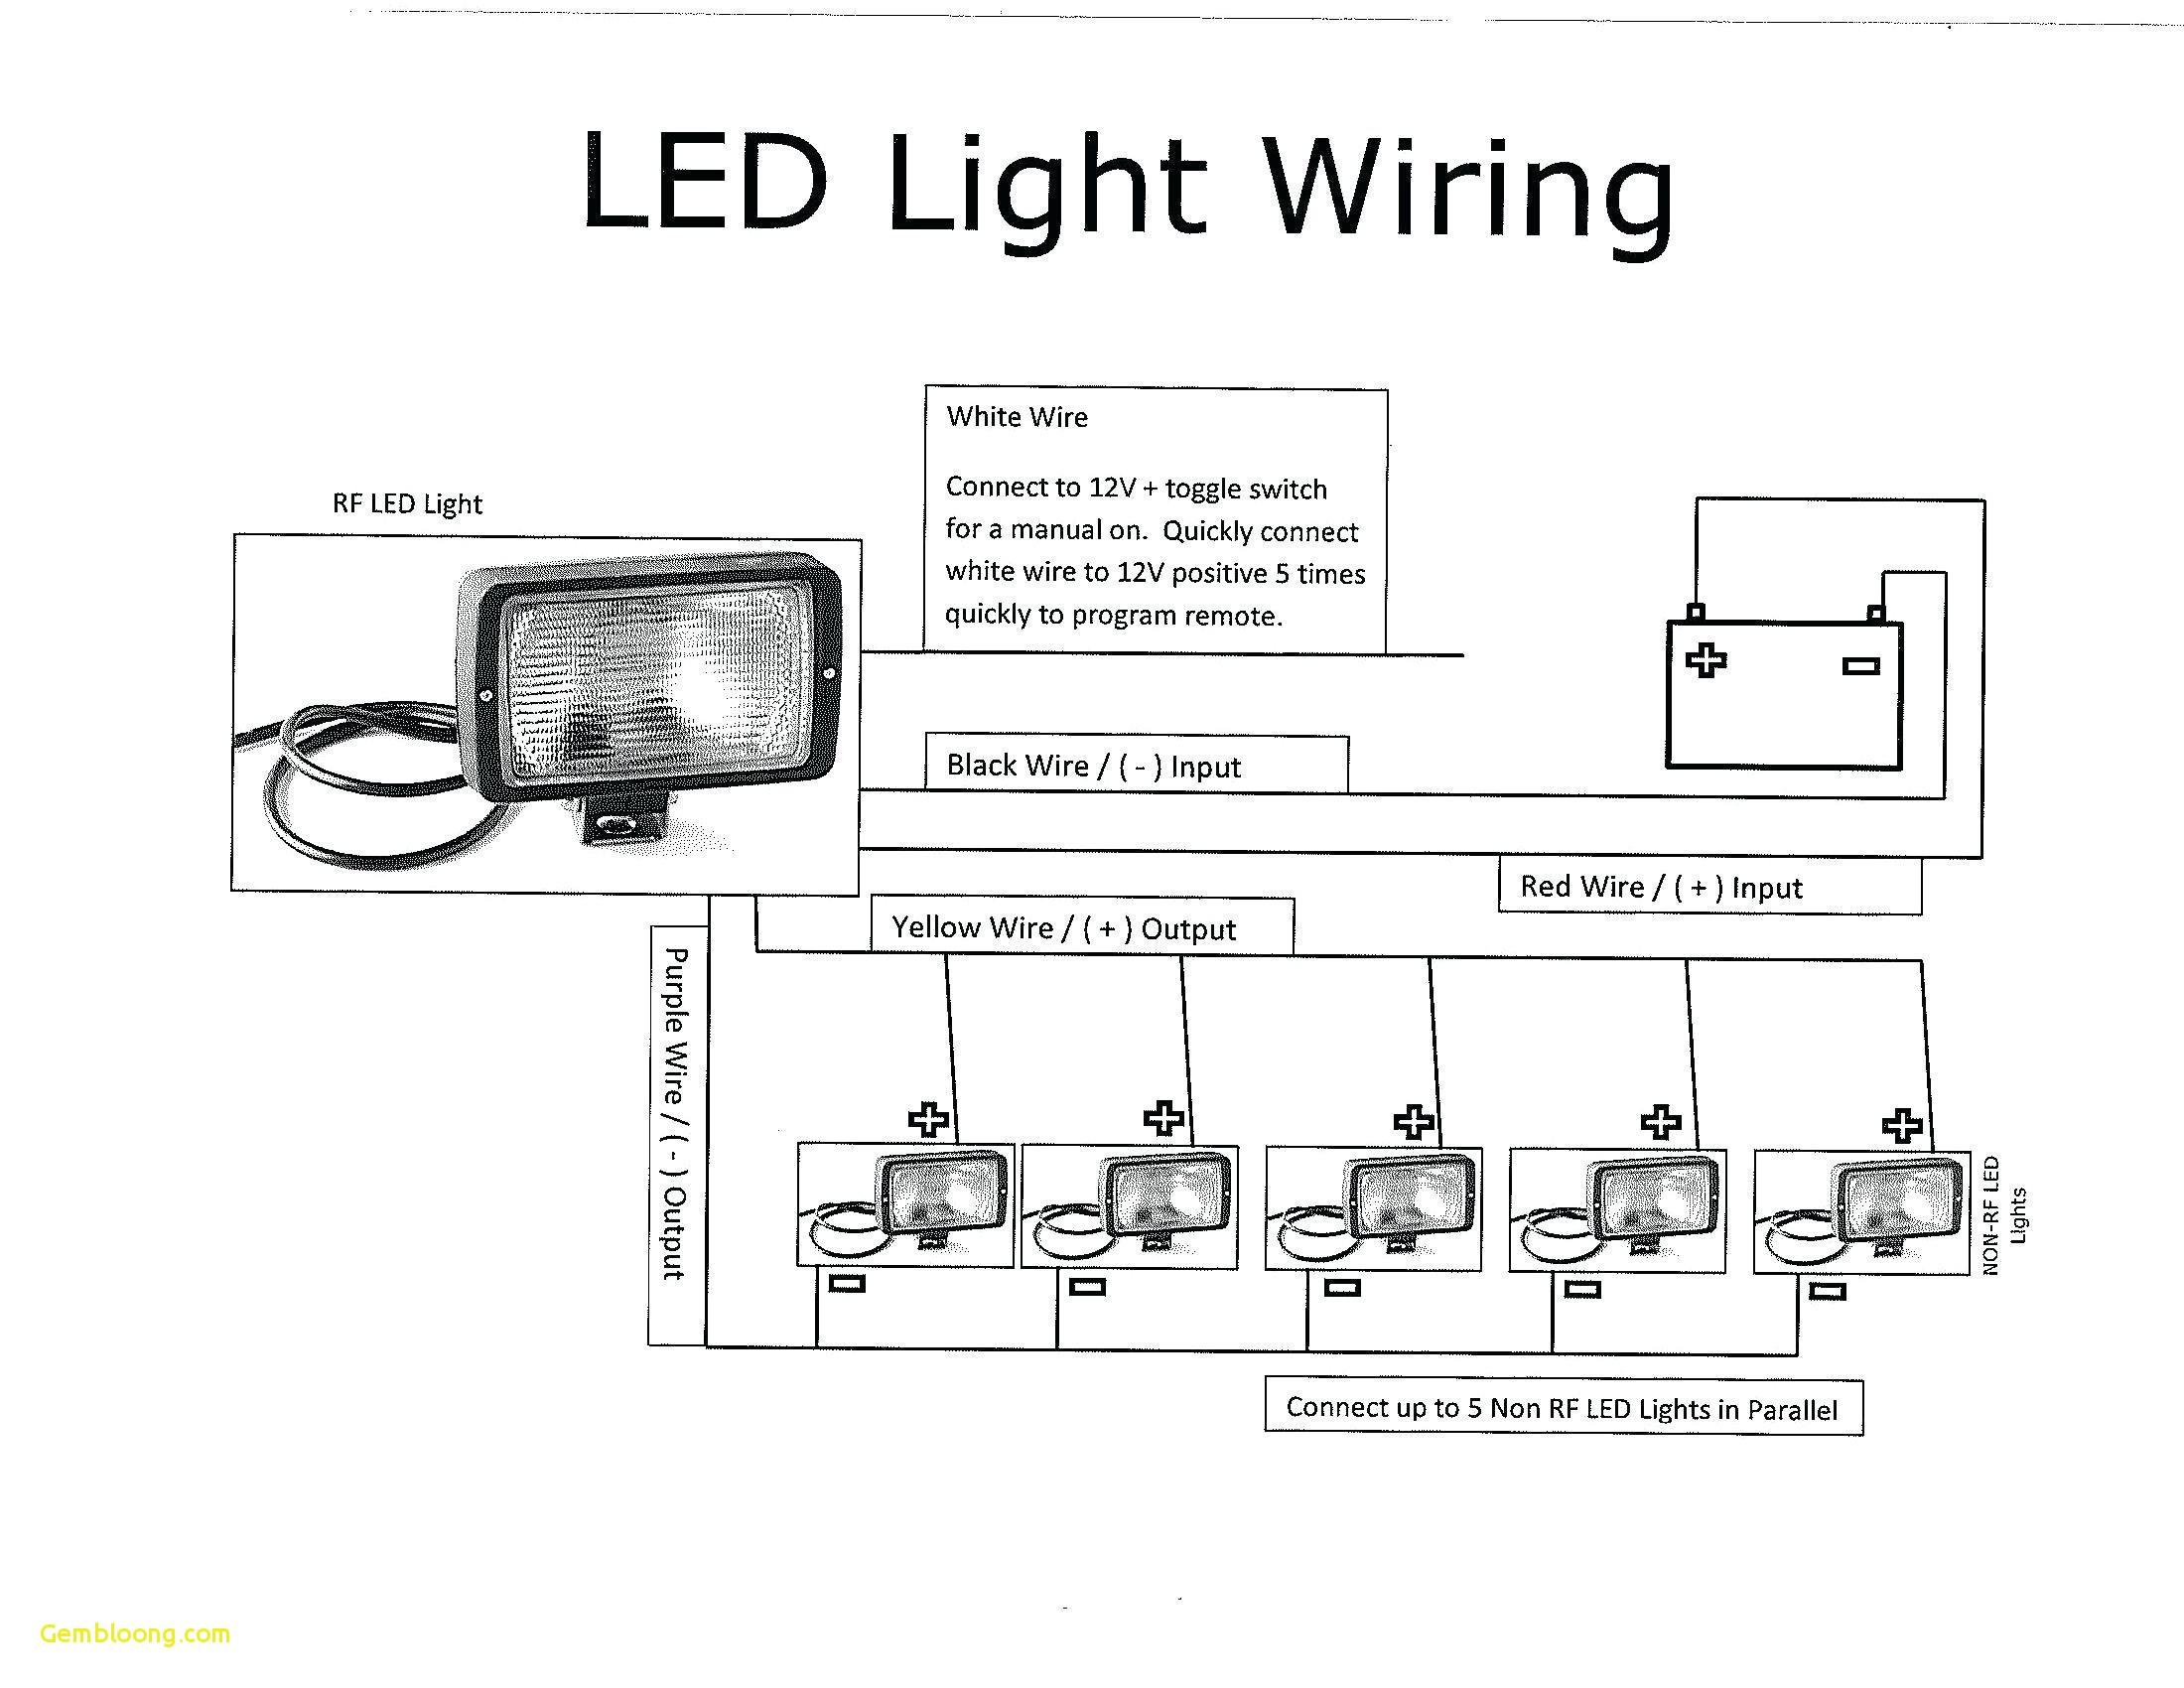 Wiring Diagram Of Led Recessed Lighting | Wiring Library - Recessed Lighting Wiring Diagram